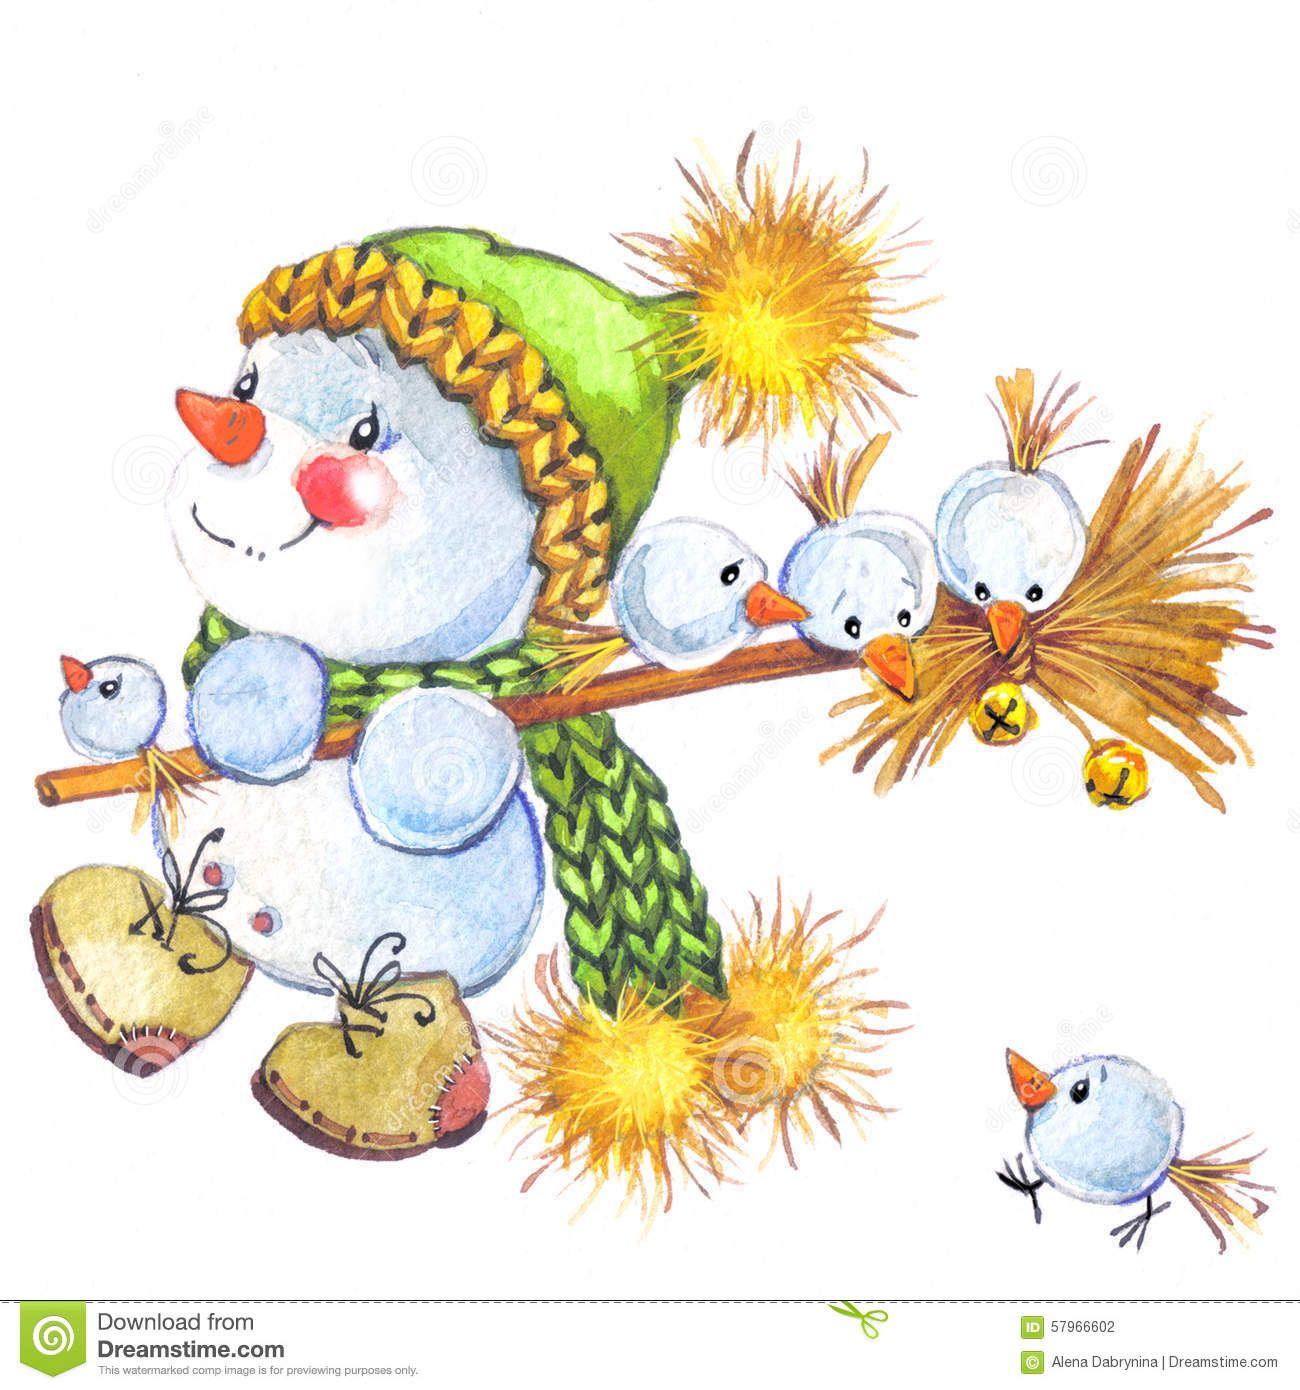 Pin By On Pinterest Snowman Snowman Clipart